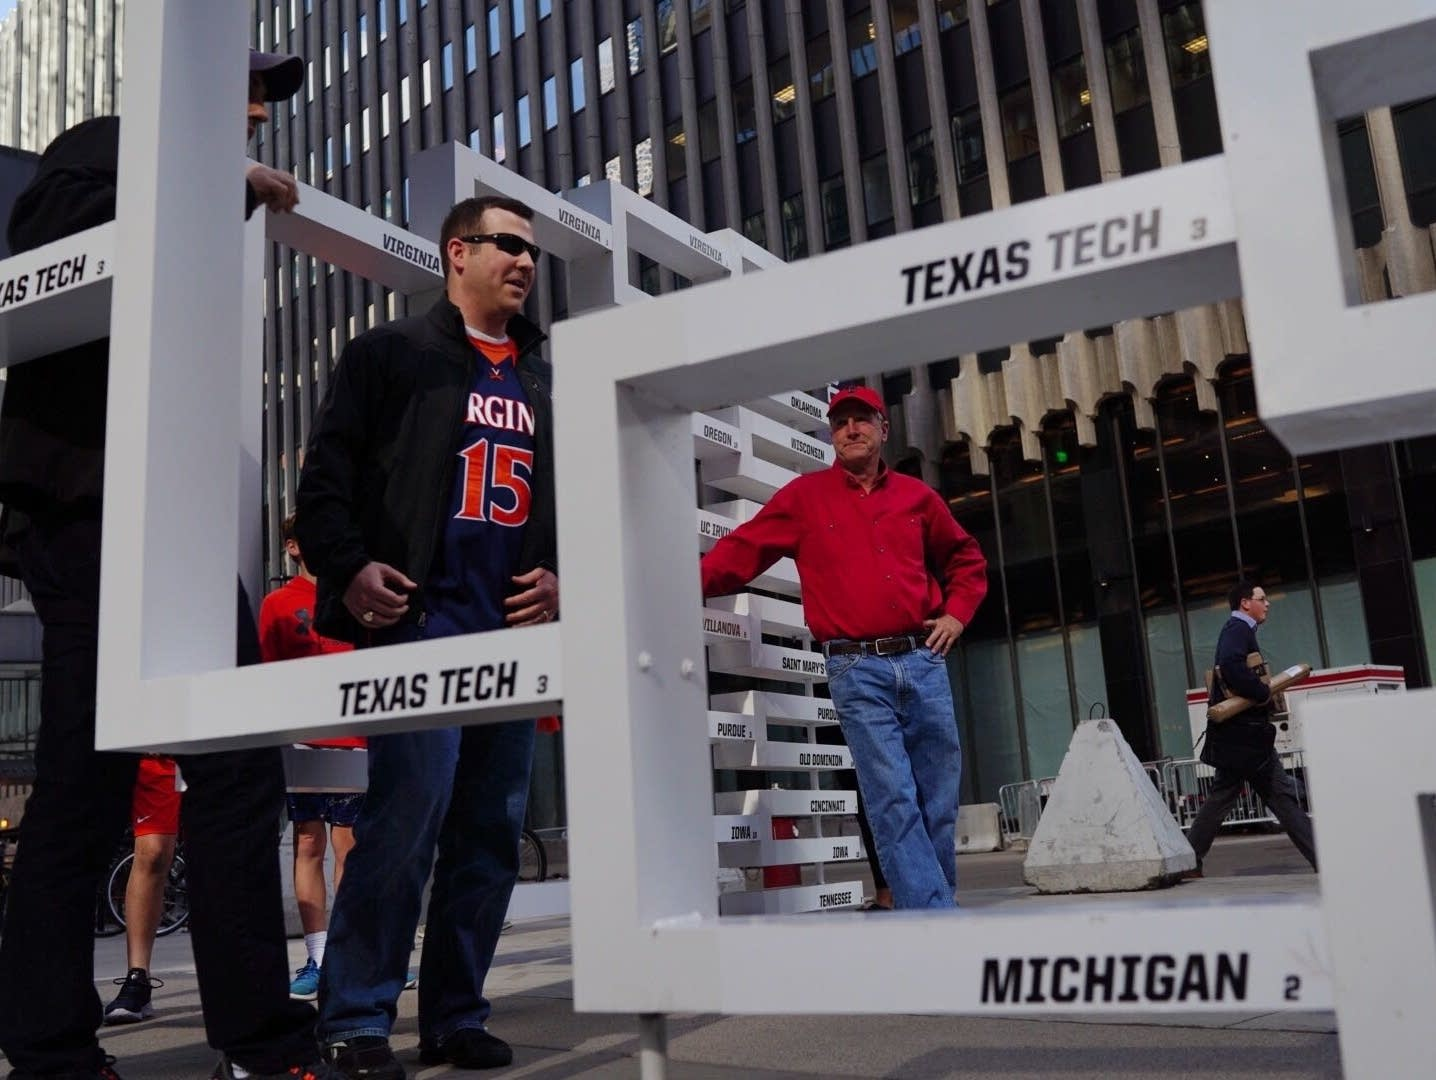 A Texas Tech fan waits to take a photo with a March Madness bracket.